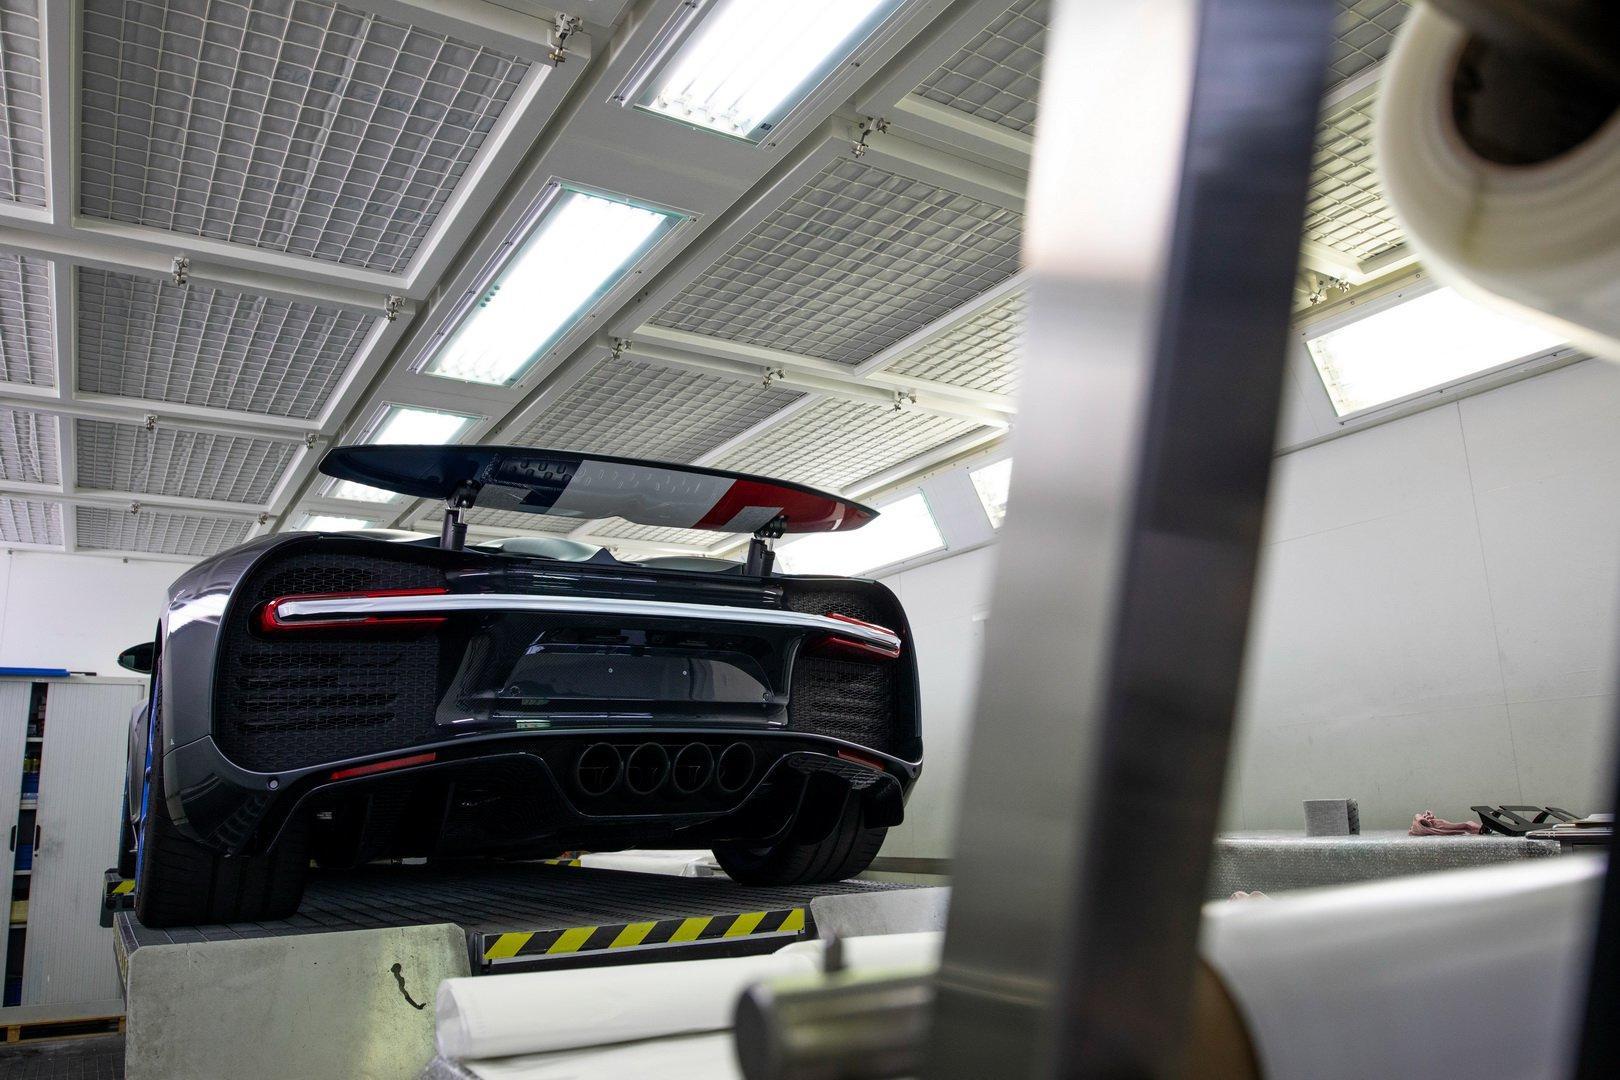 Al 200-lea Bugatti Chiron - Al 200-lea Bugatti Chiron